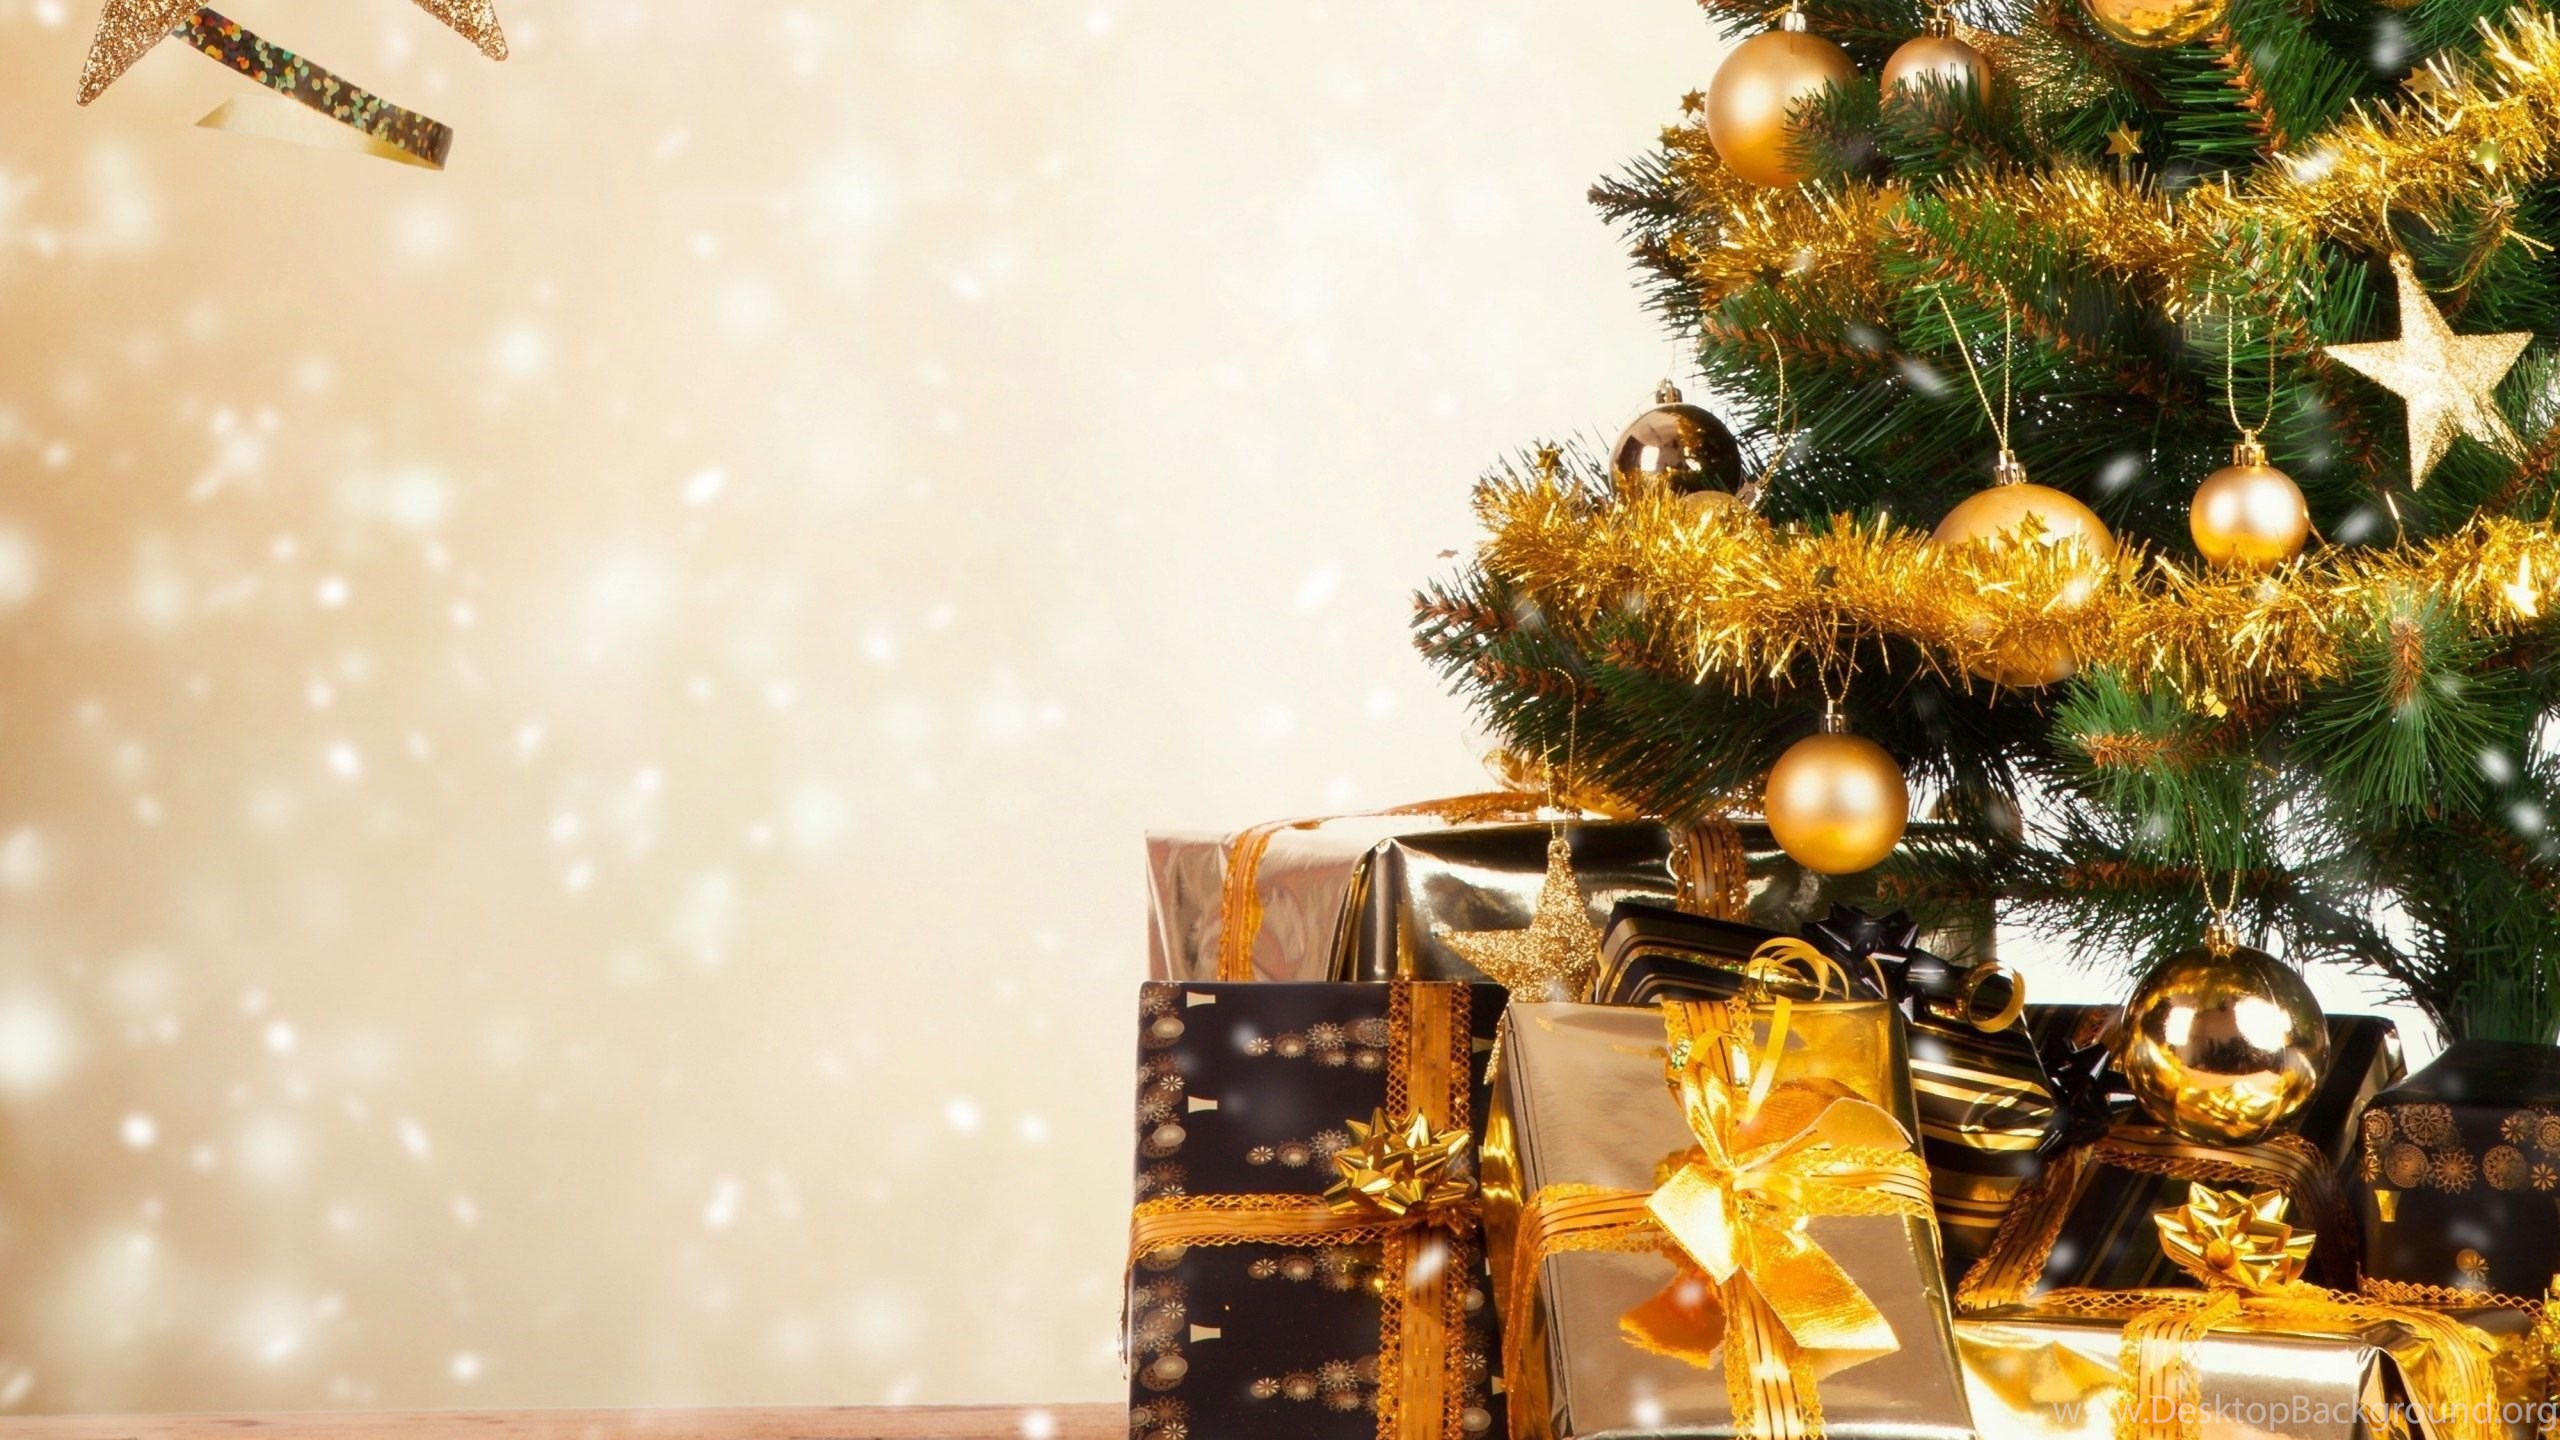 Christmas Tree With Gifts Wallpapers Hd Free Best Hd Desktop Desktop Background